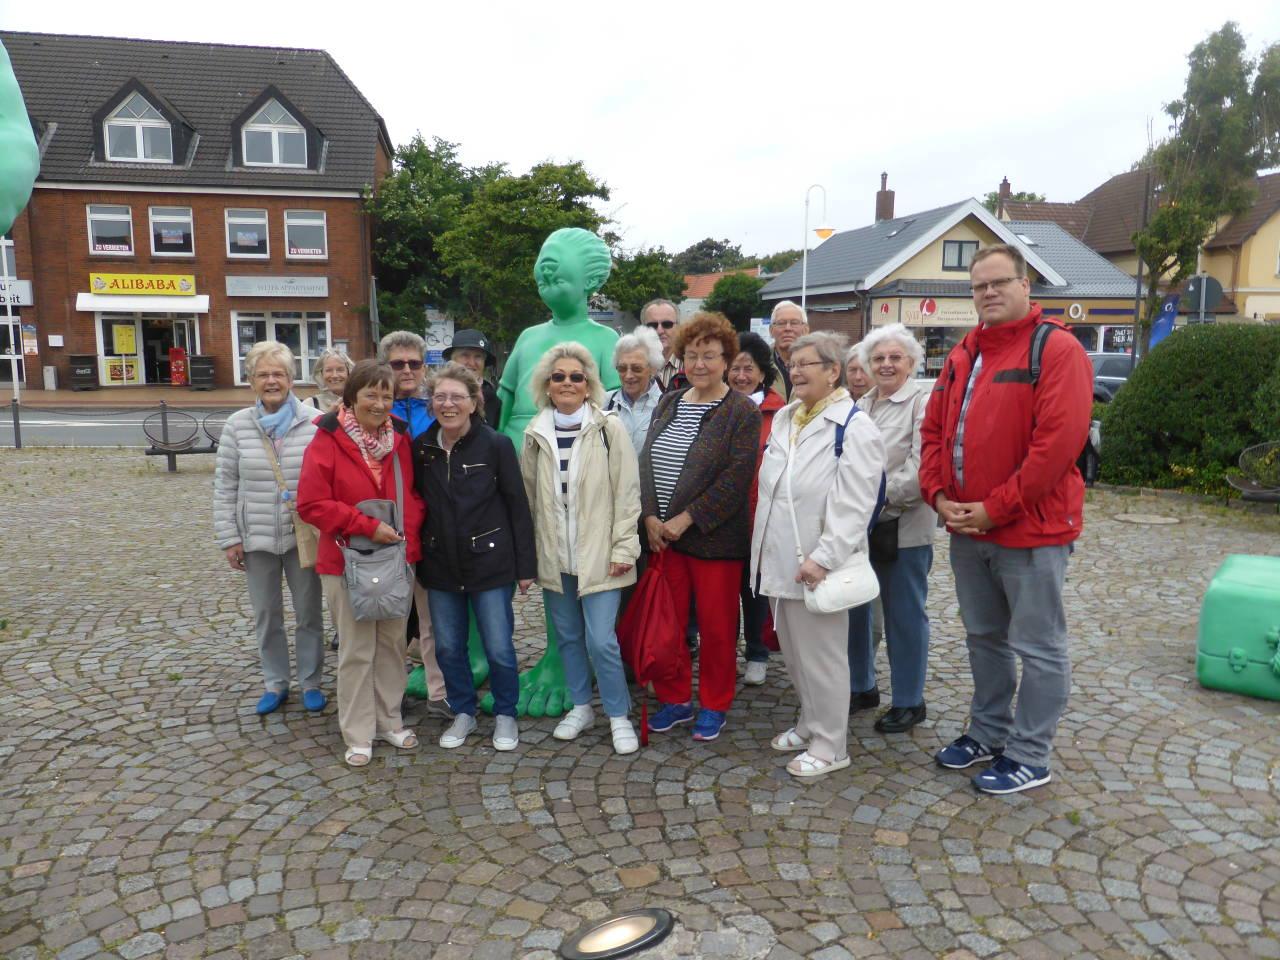 Grppenbild Westerland/Sylt 27.06.2016